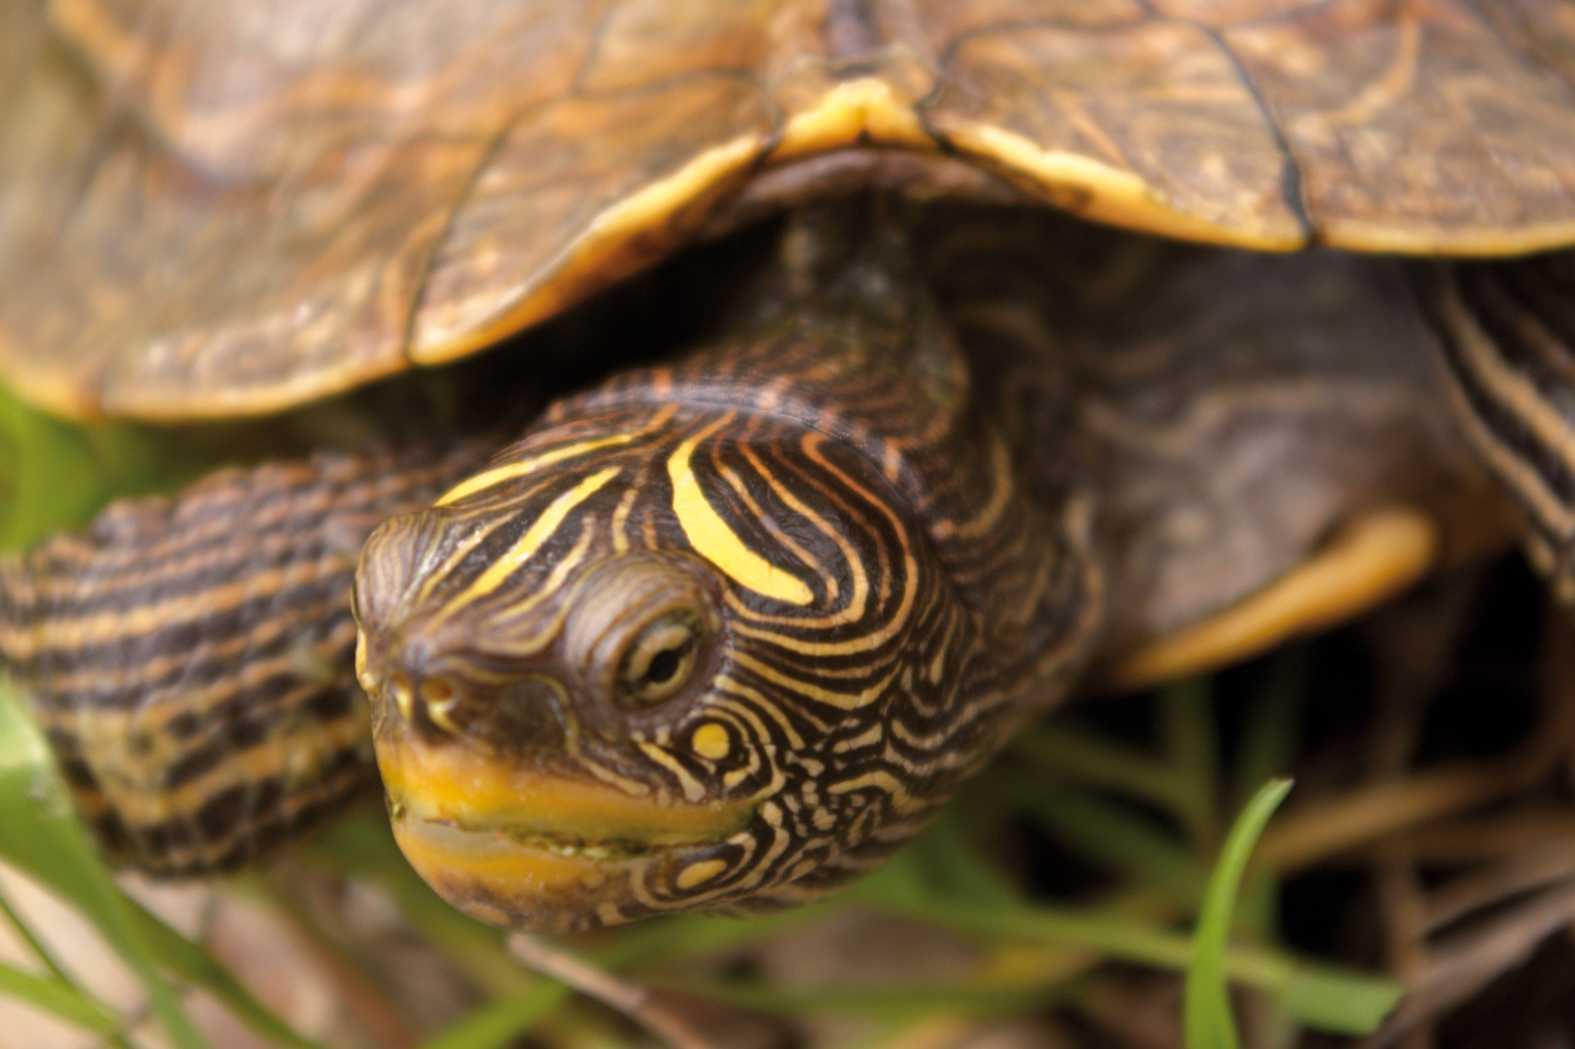 Centro de reproducción de tortugas